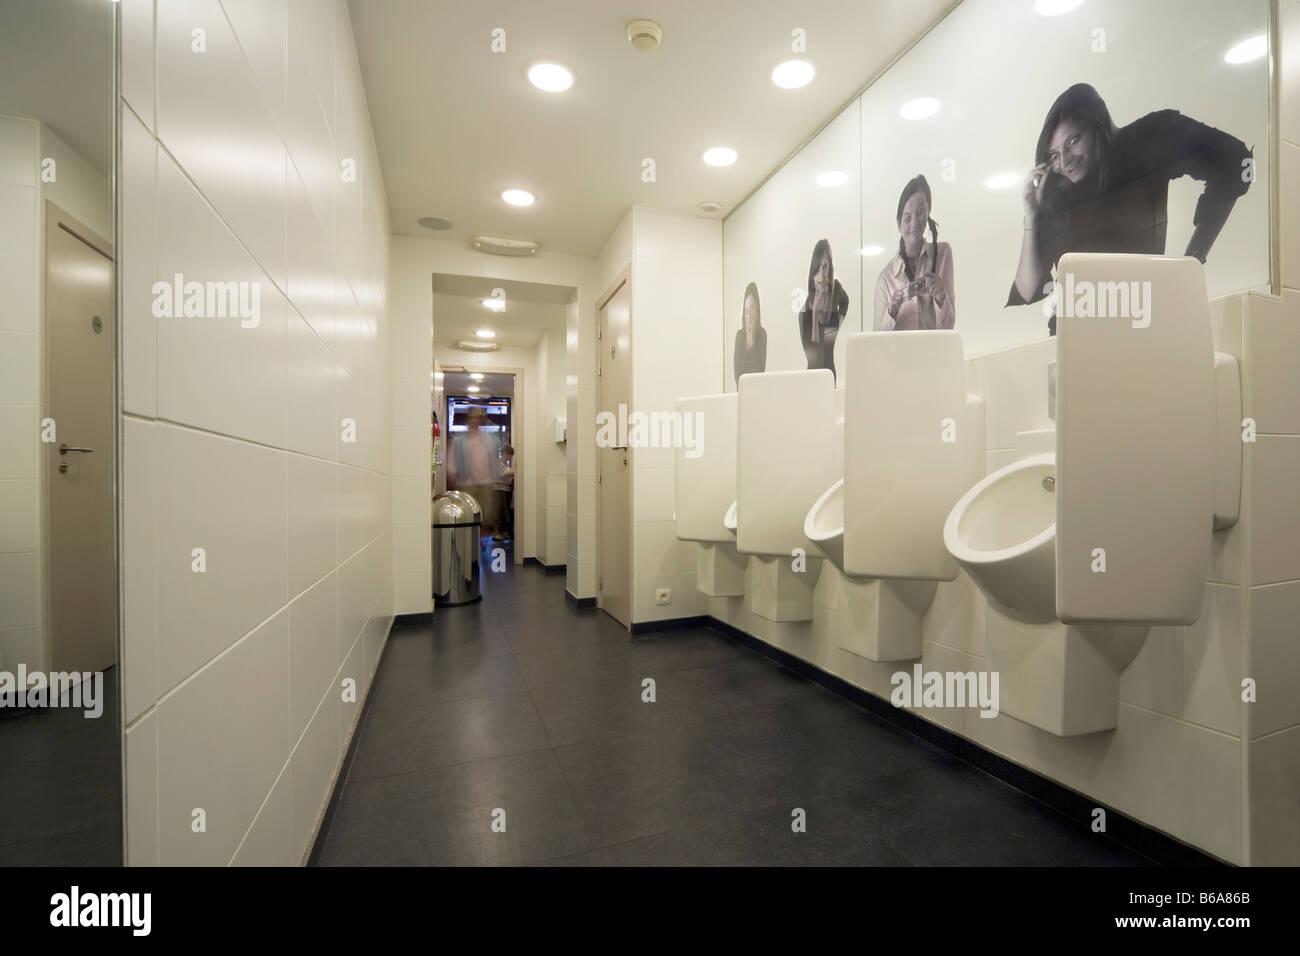 Mens Bathroom; Restroom; Toilet; Urinals At A Brussels Restaurant. 4 Women  Onlookers, Amused, Making Jokes